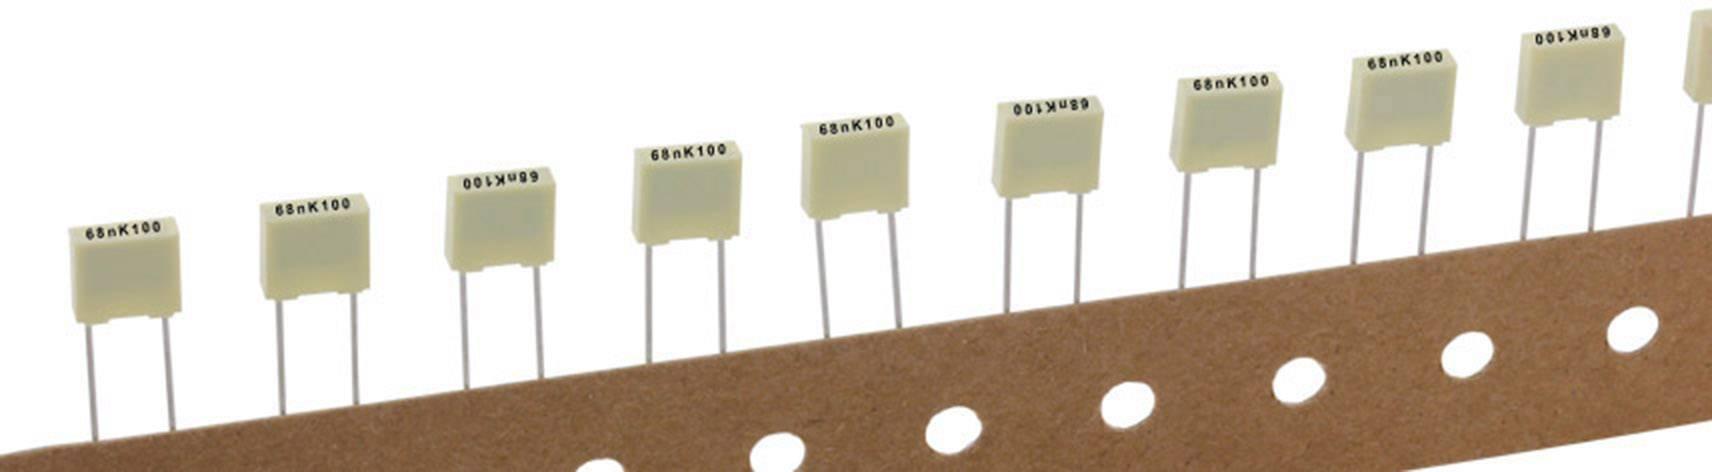 Polyesterový kondenzátor Kemet R82EC1330DQ50K+ radiálne vývody, 3.3 nF, 100 V,10 %, 5 mm, (d x š x v) 7.2 x 2.5 mm x 6.5 mm, 1 ks